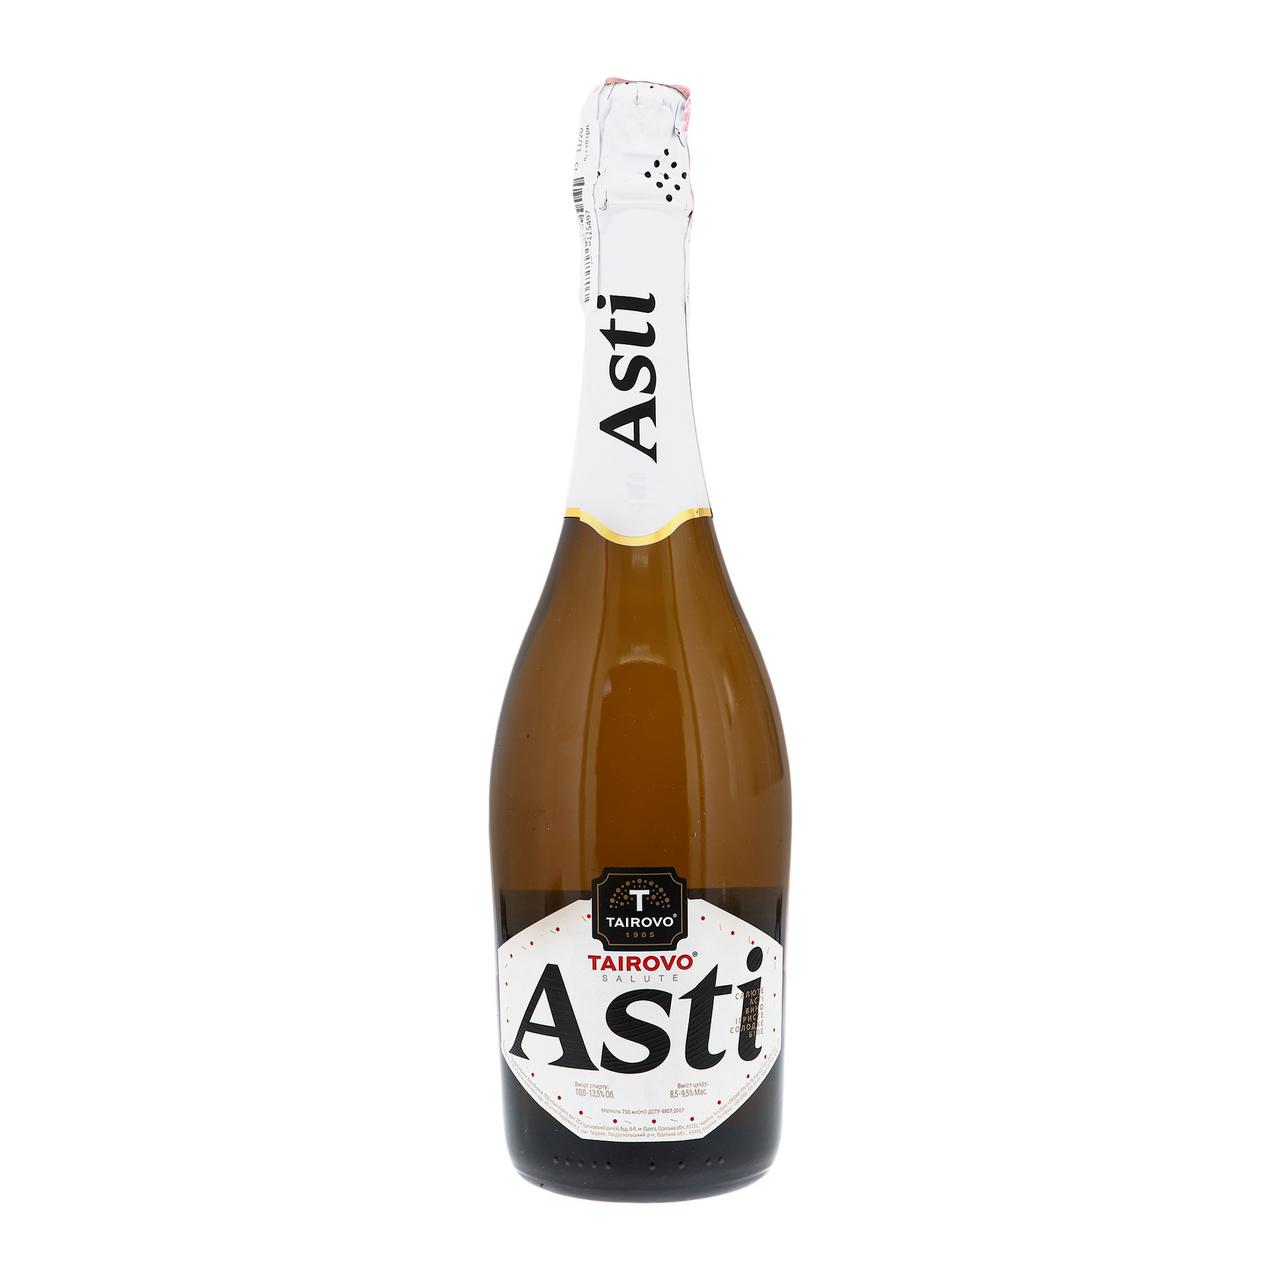 Вино ігристе Tairovo Salute Asti біле солодке 10-13.5% 0.75л